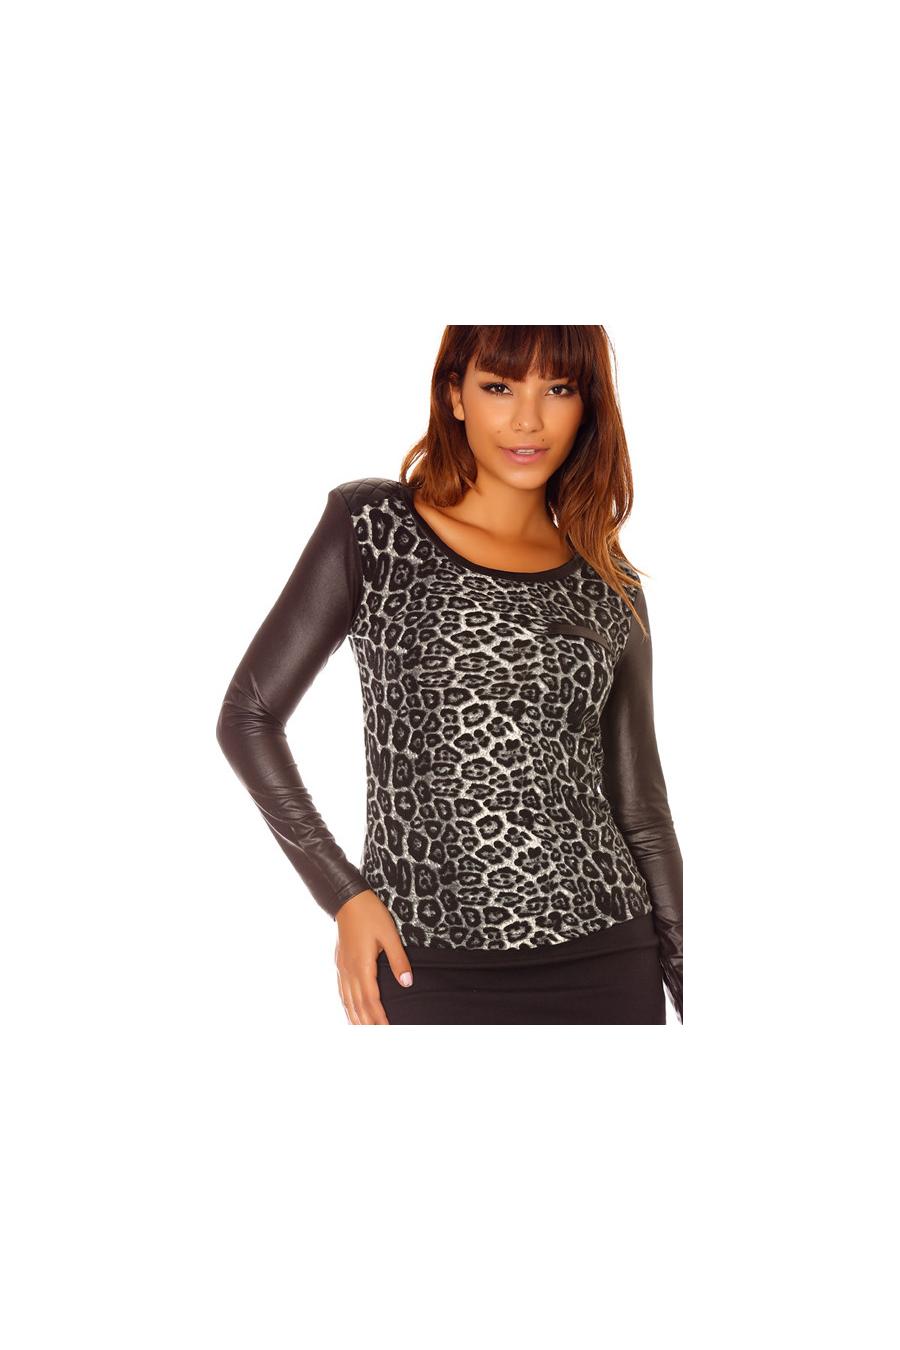 Gray leopard print top, bi-material and long sleeve. 2530